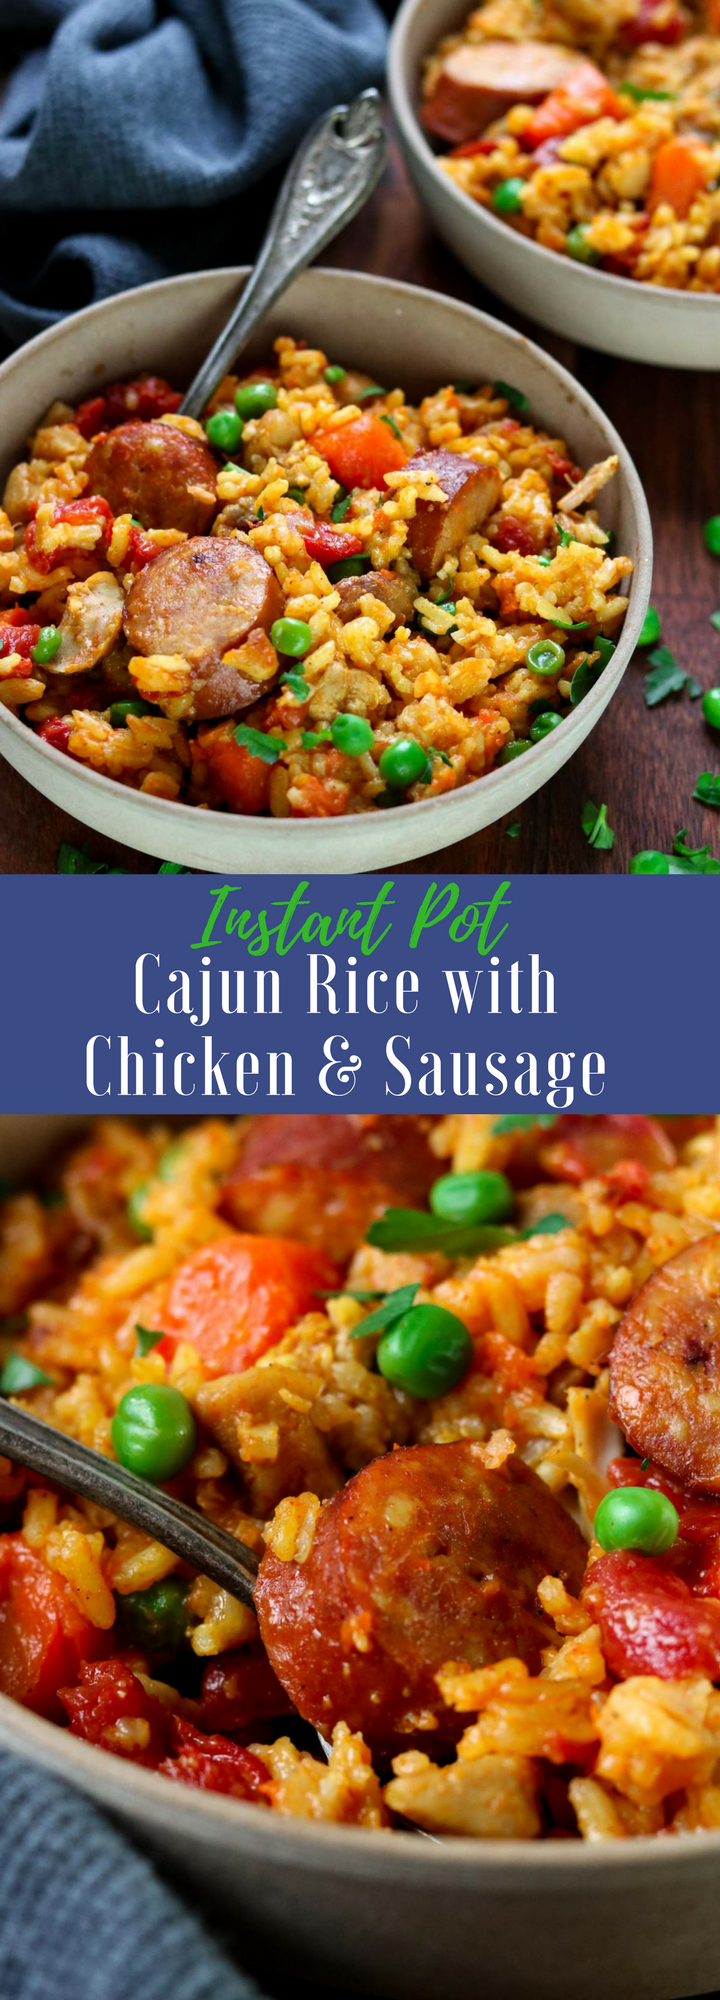 Photo of Instant Pot Cajun Rice with Chicken and Sausage #seasonedricerecipes Instant Pot…